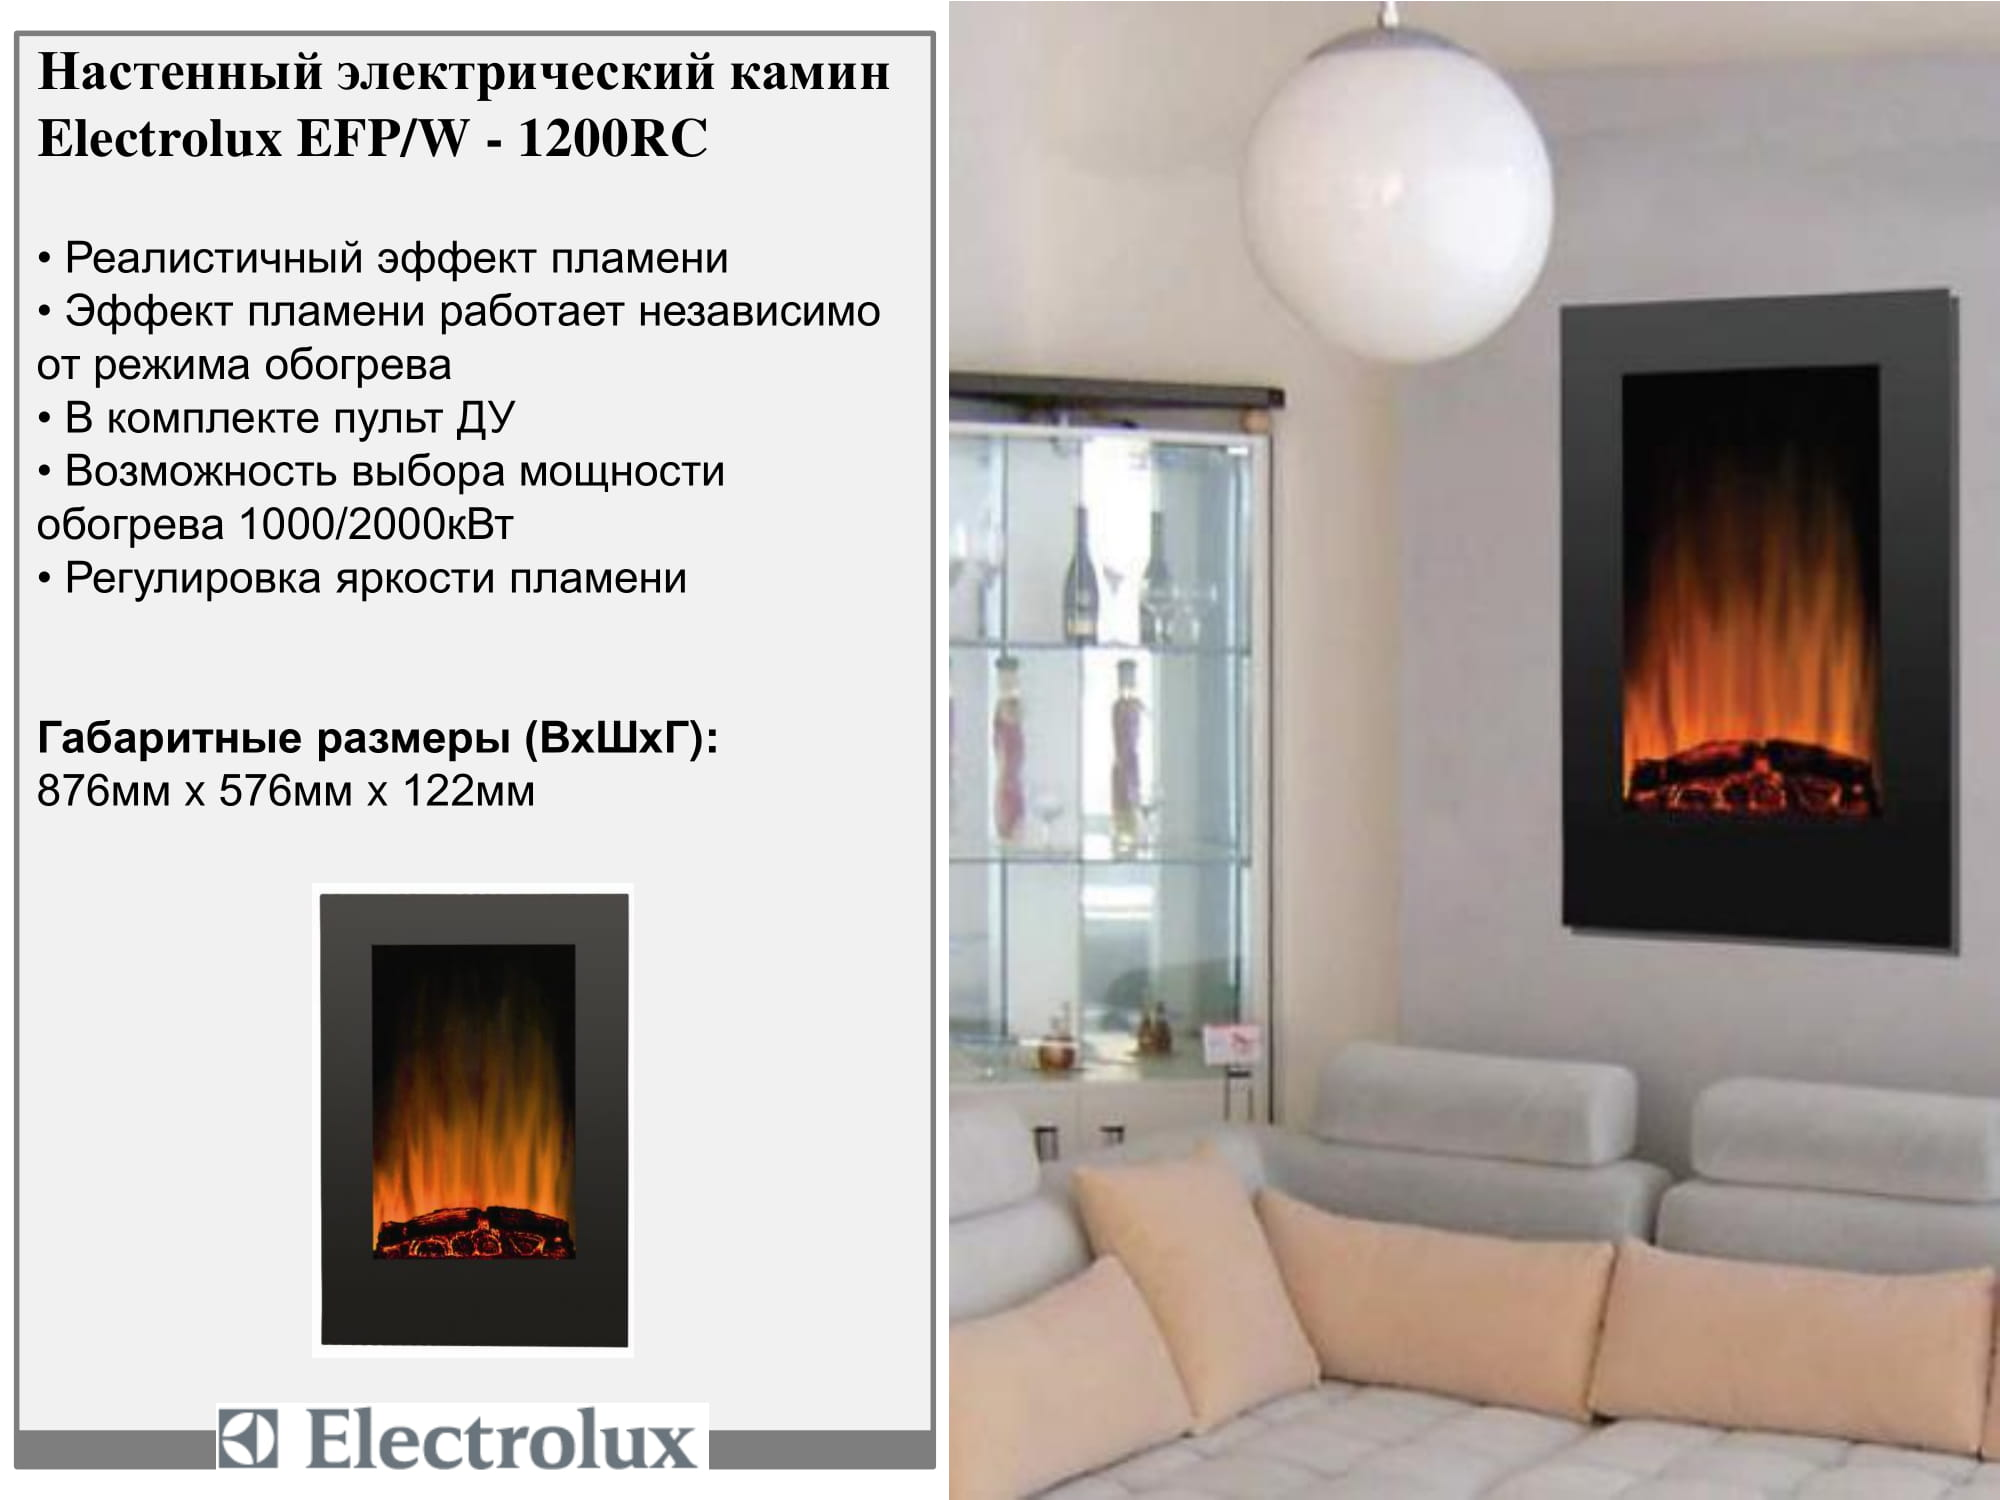 Electrolux EFP/W-1200RC